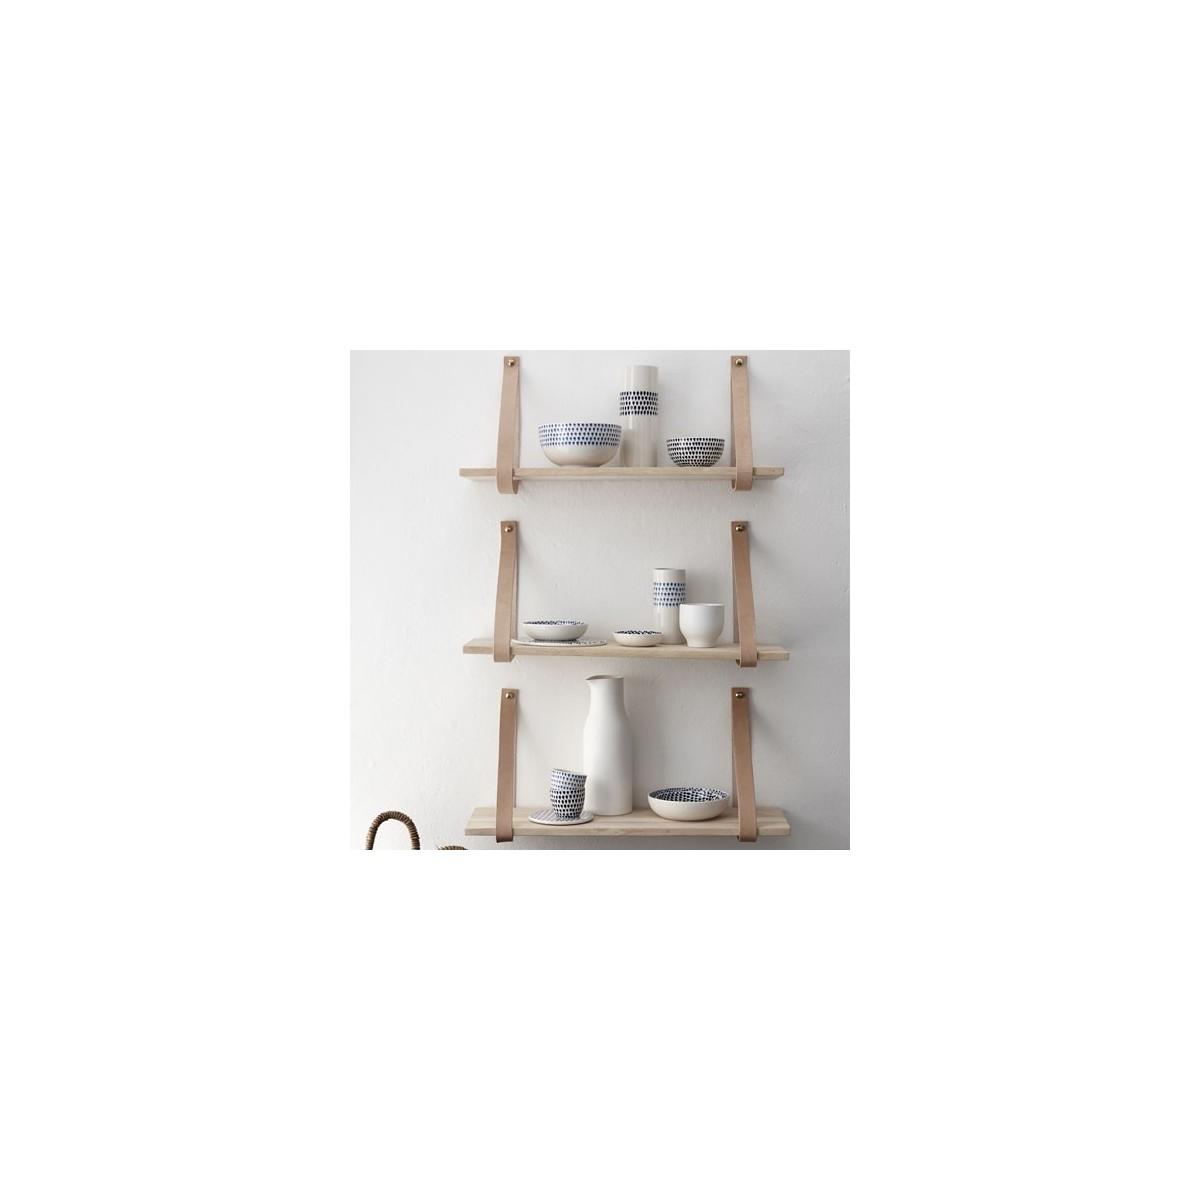 etag re ch ne cuir. Black Bedroom Furniture Sets. Home Design Ideas